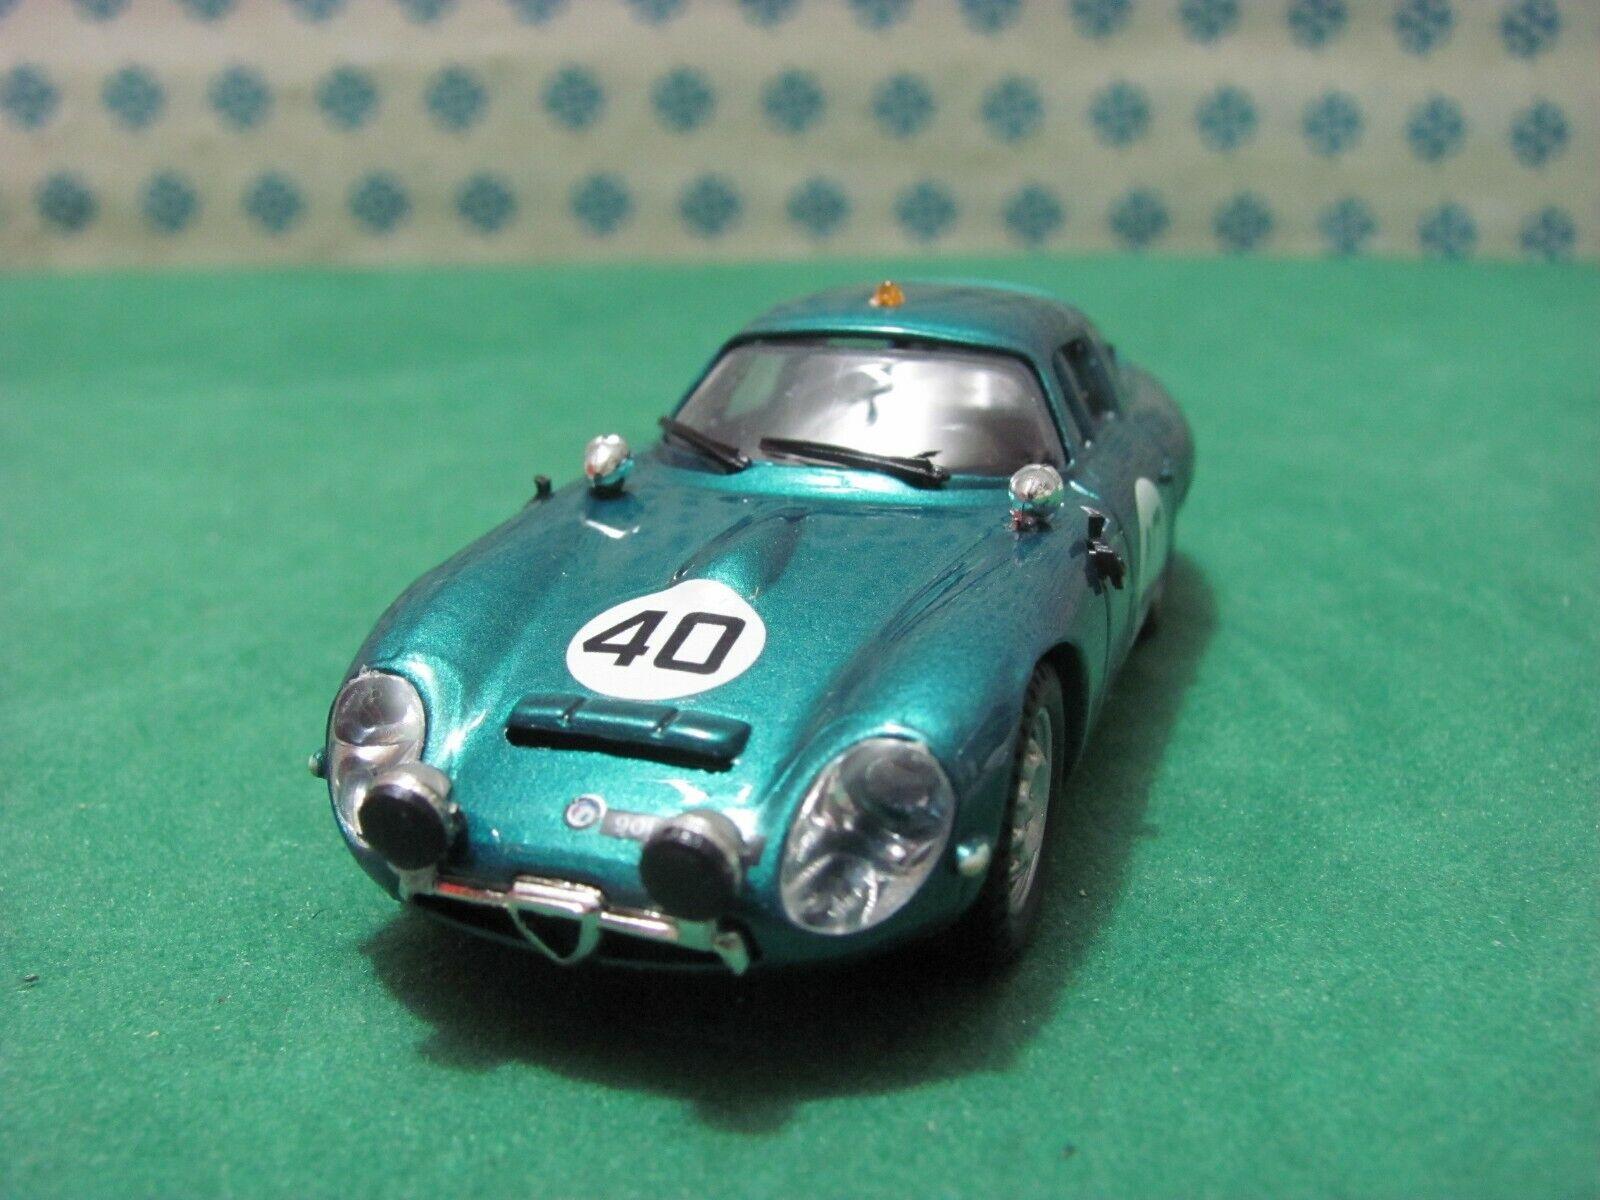 ALFA  ROMEO Giulia TZ 1 Zagato coupé 1600  Le Mans 1964  - 1 43 Best 9068  derniers styles